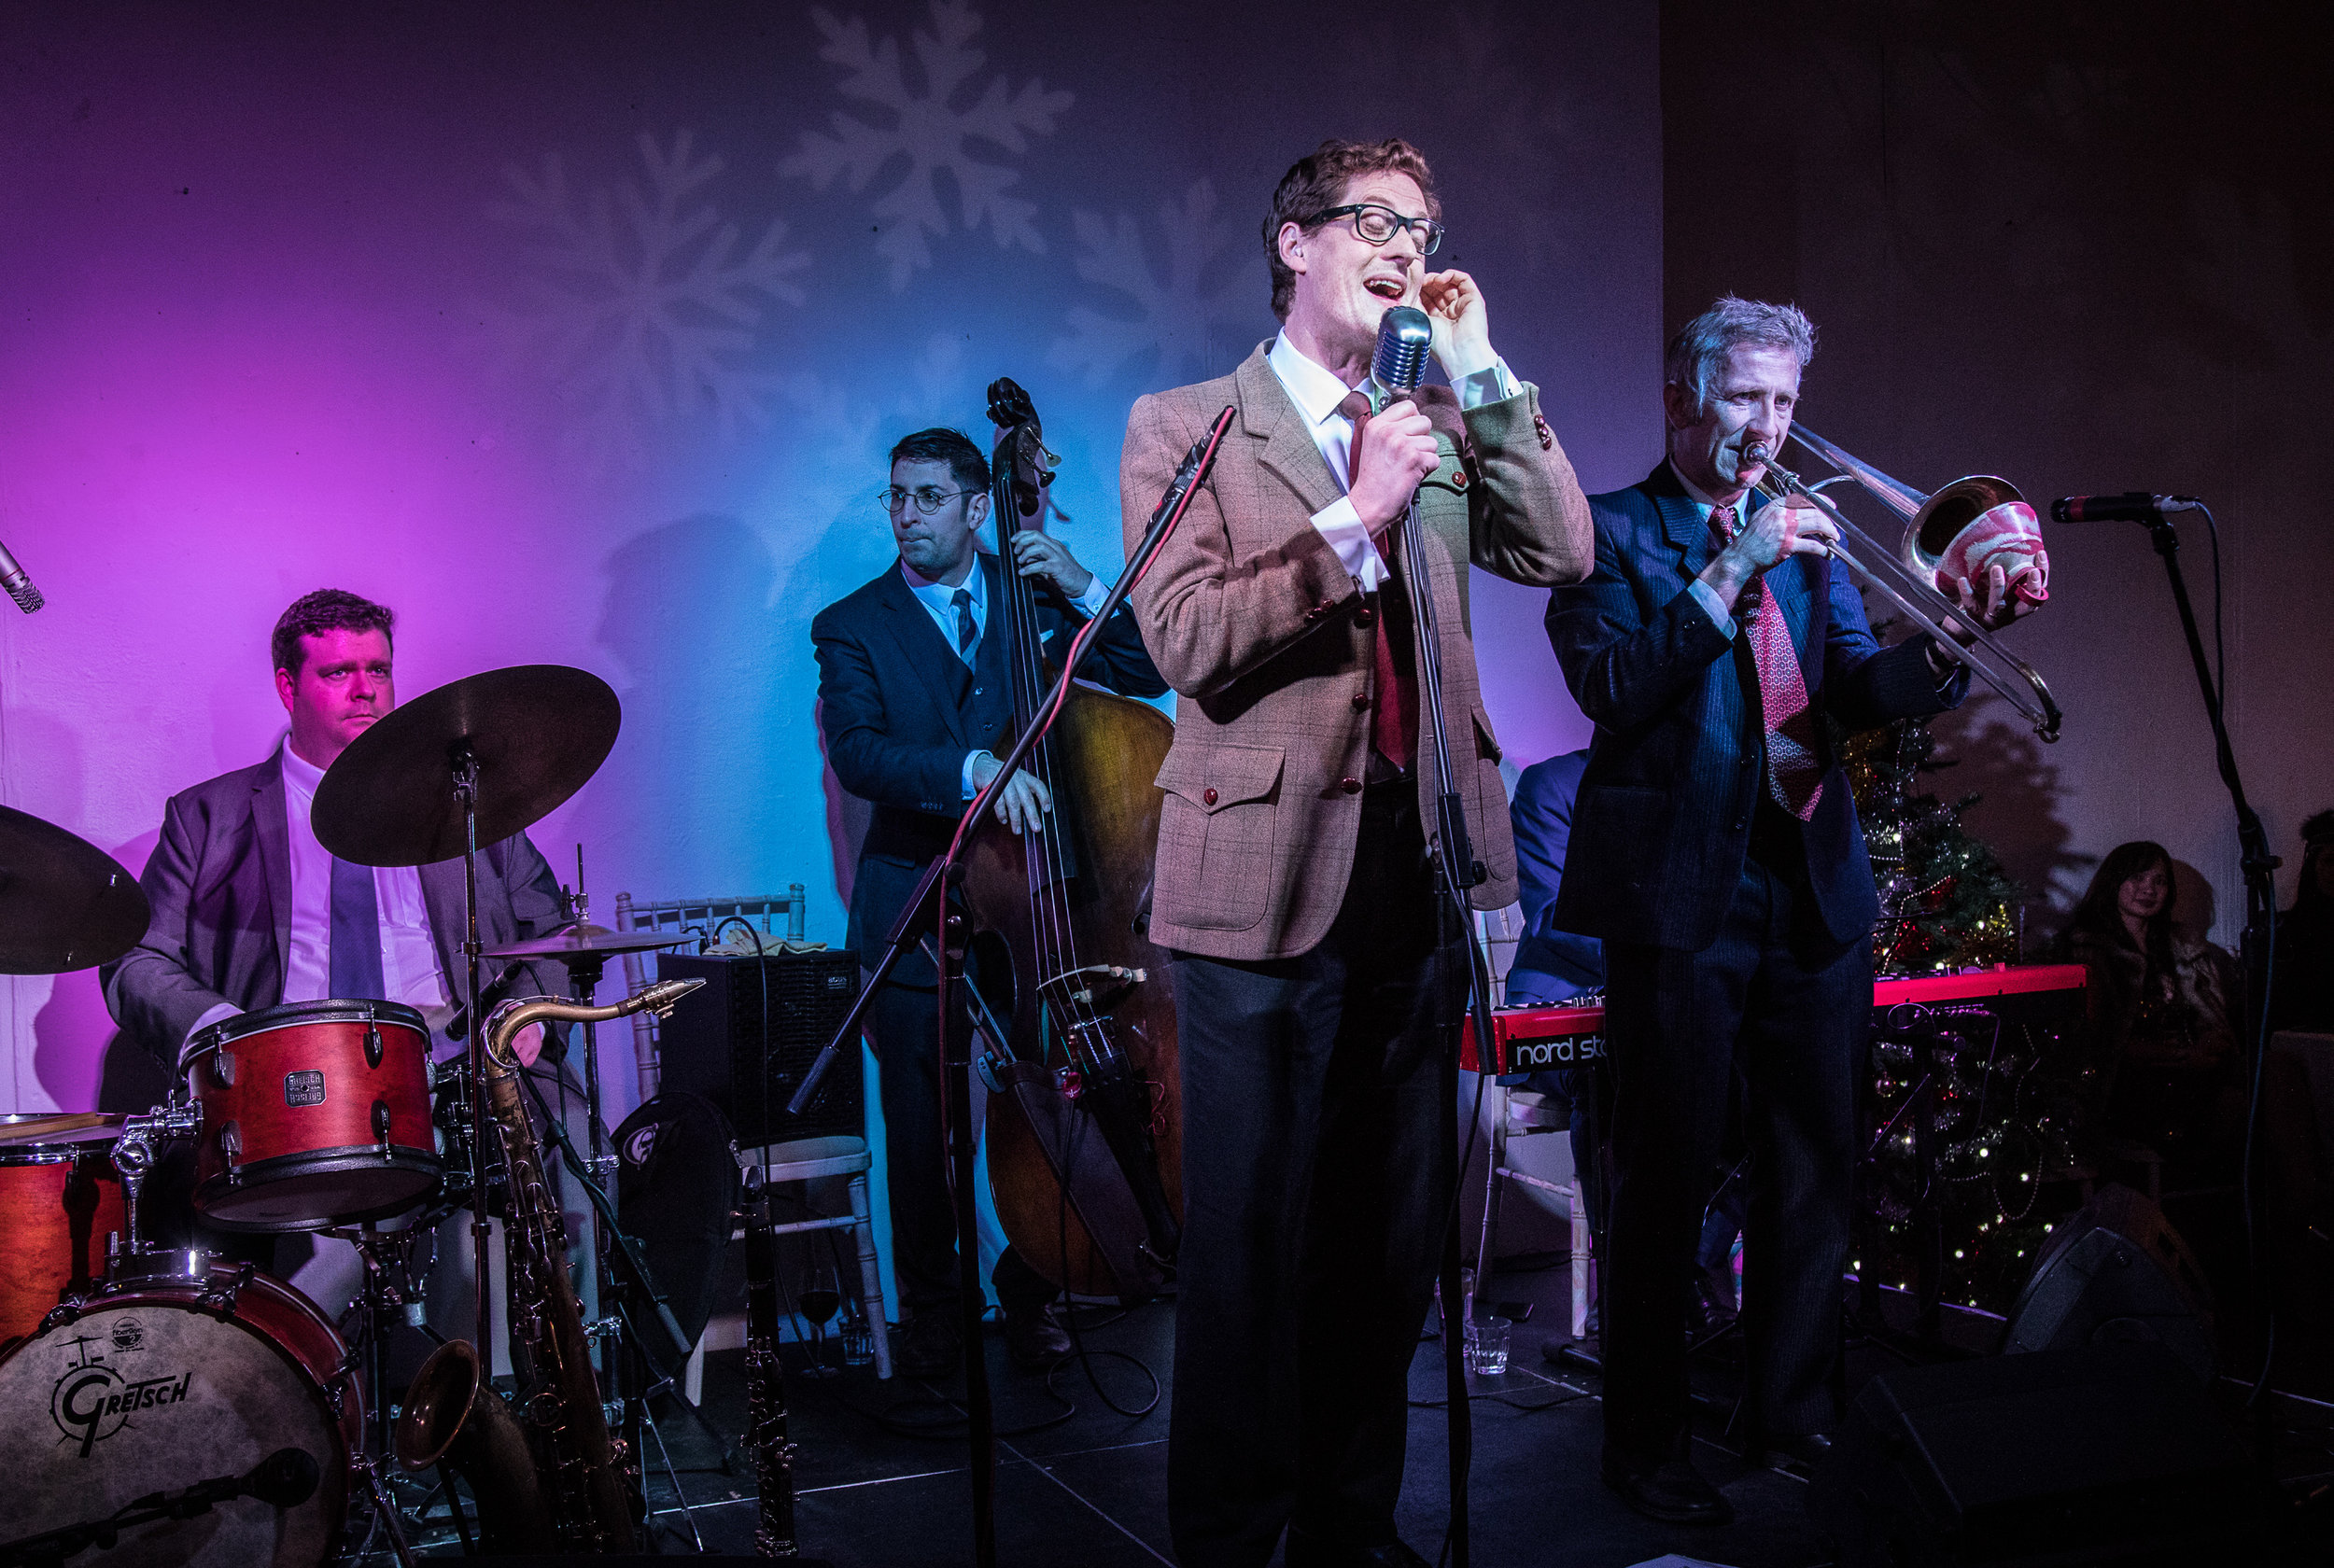 Duncan Hemstock and his All Stars at Christmas